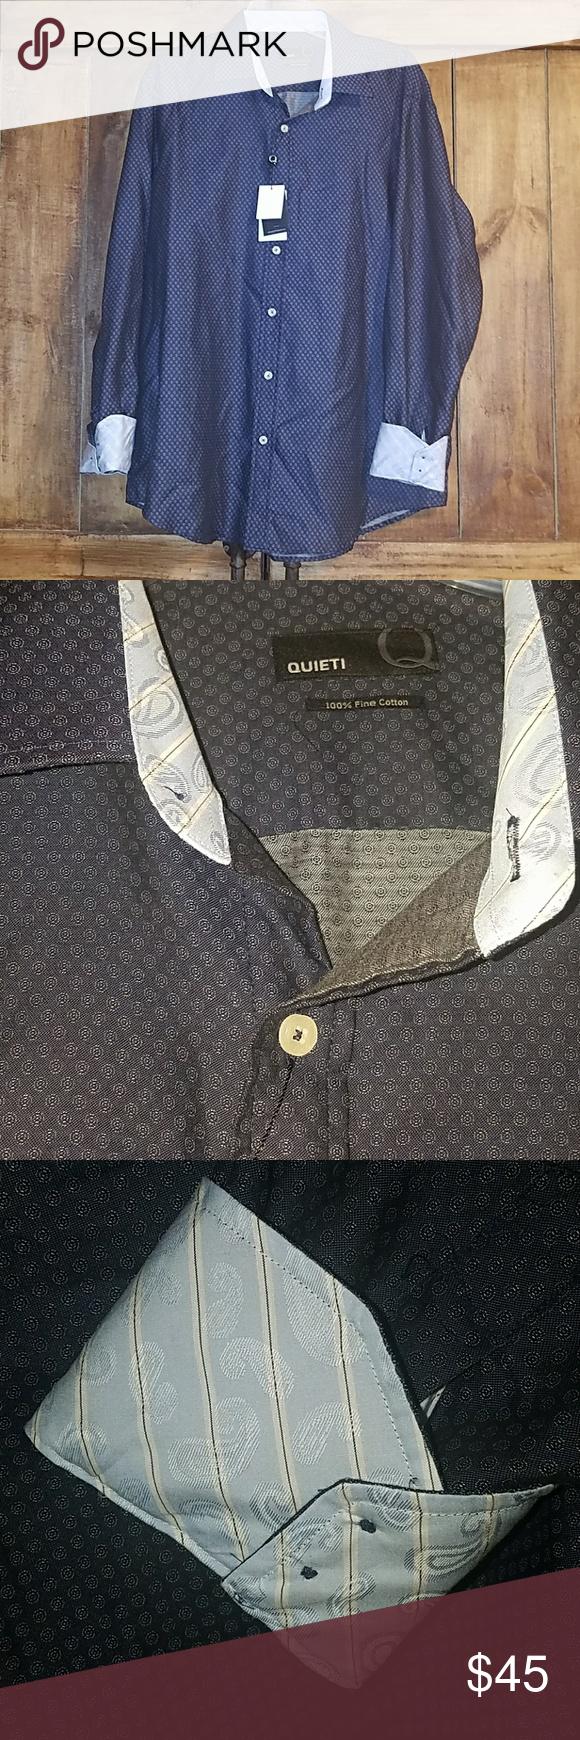 Quieti mens xl long sleeve dress shirt nwt dress shirts sleeved